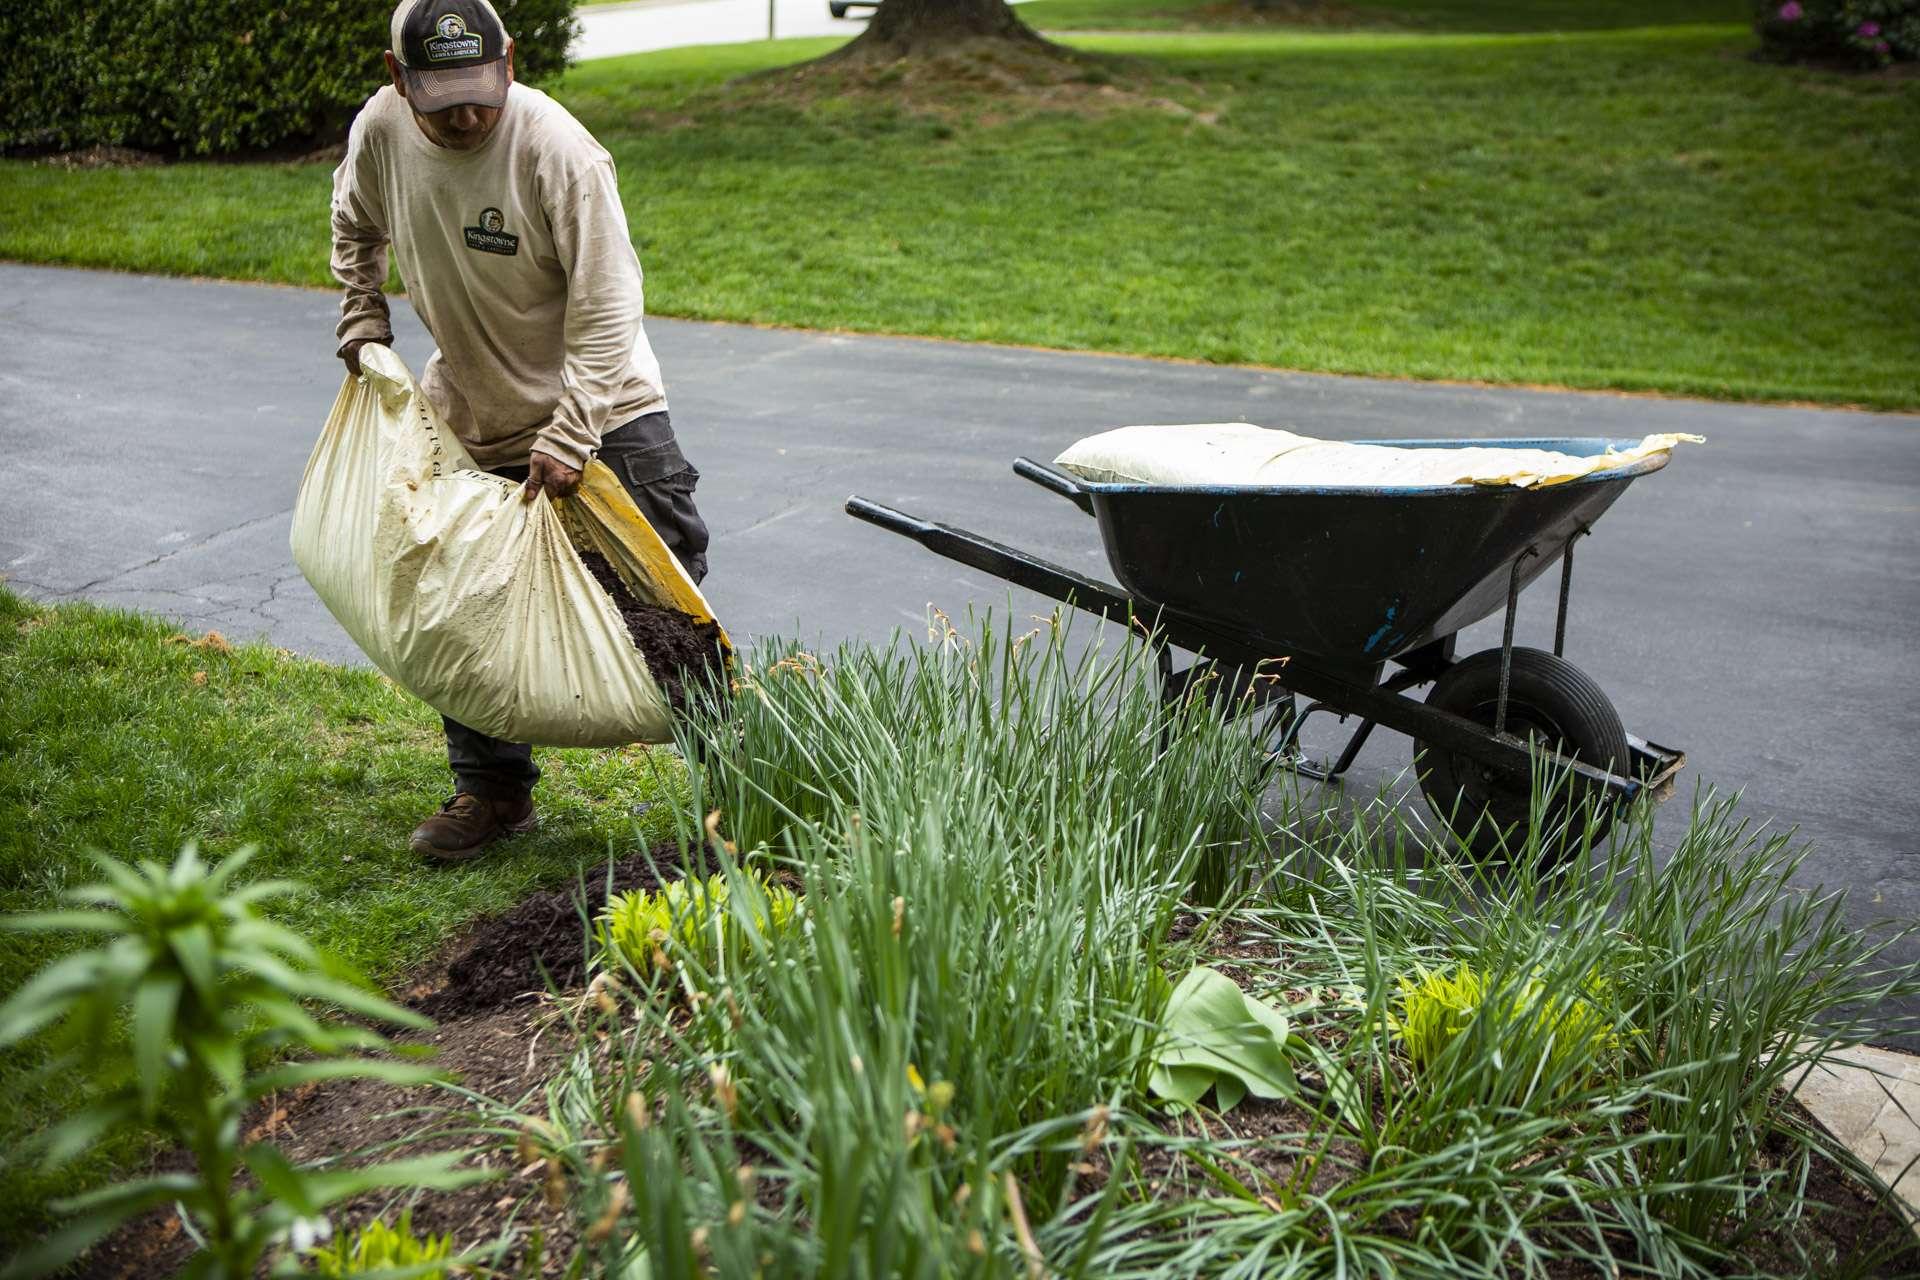 maintenance-mulch-bag-plantings-wheelbarrow-2